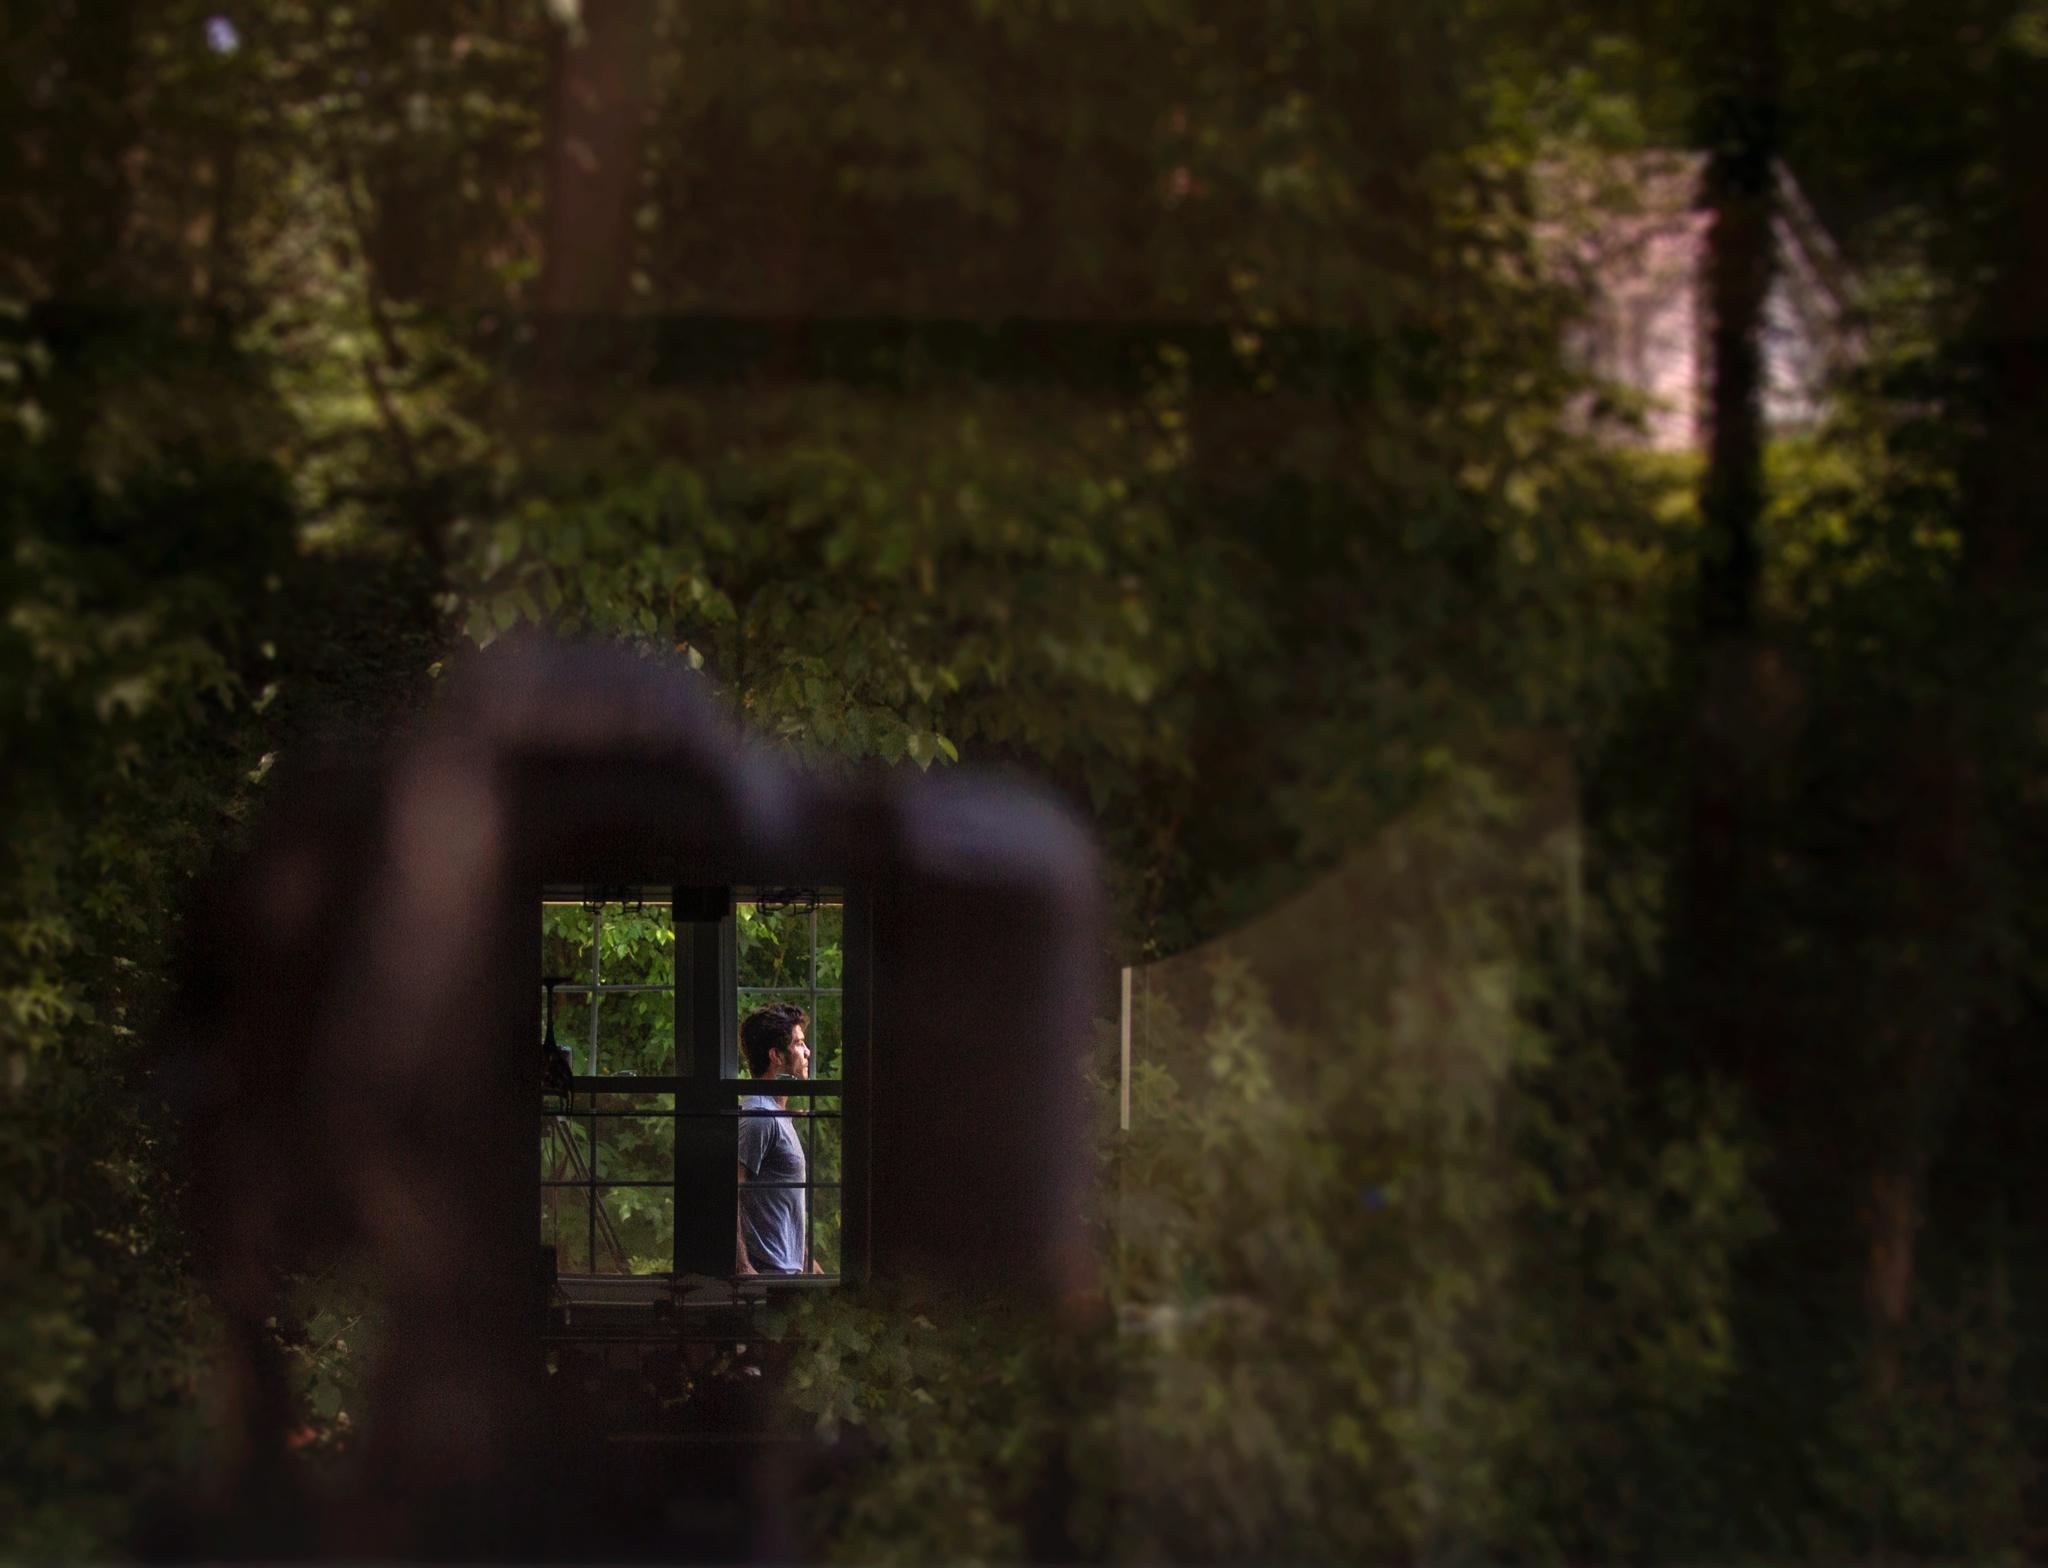 camera_reflection_window.jpg